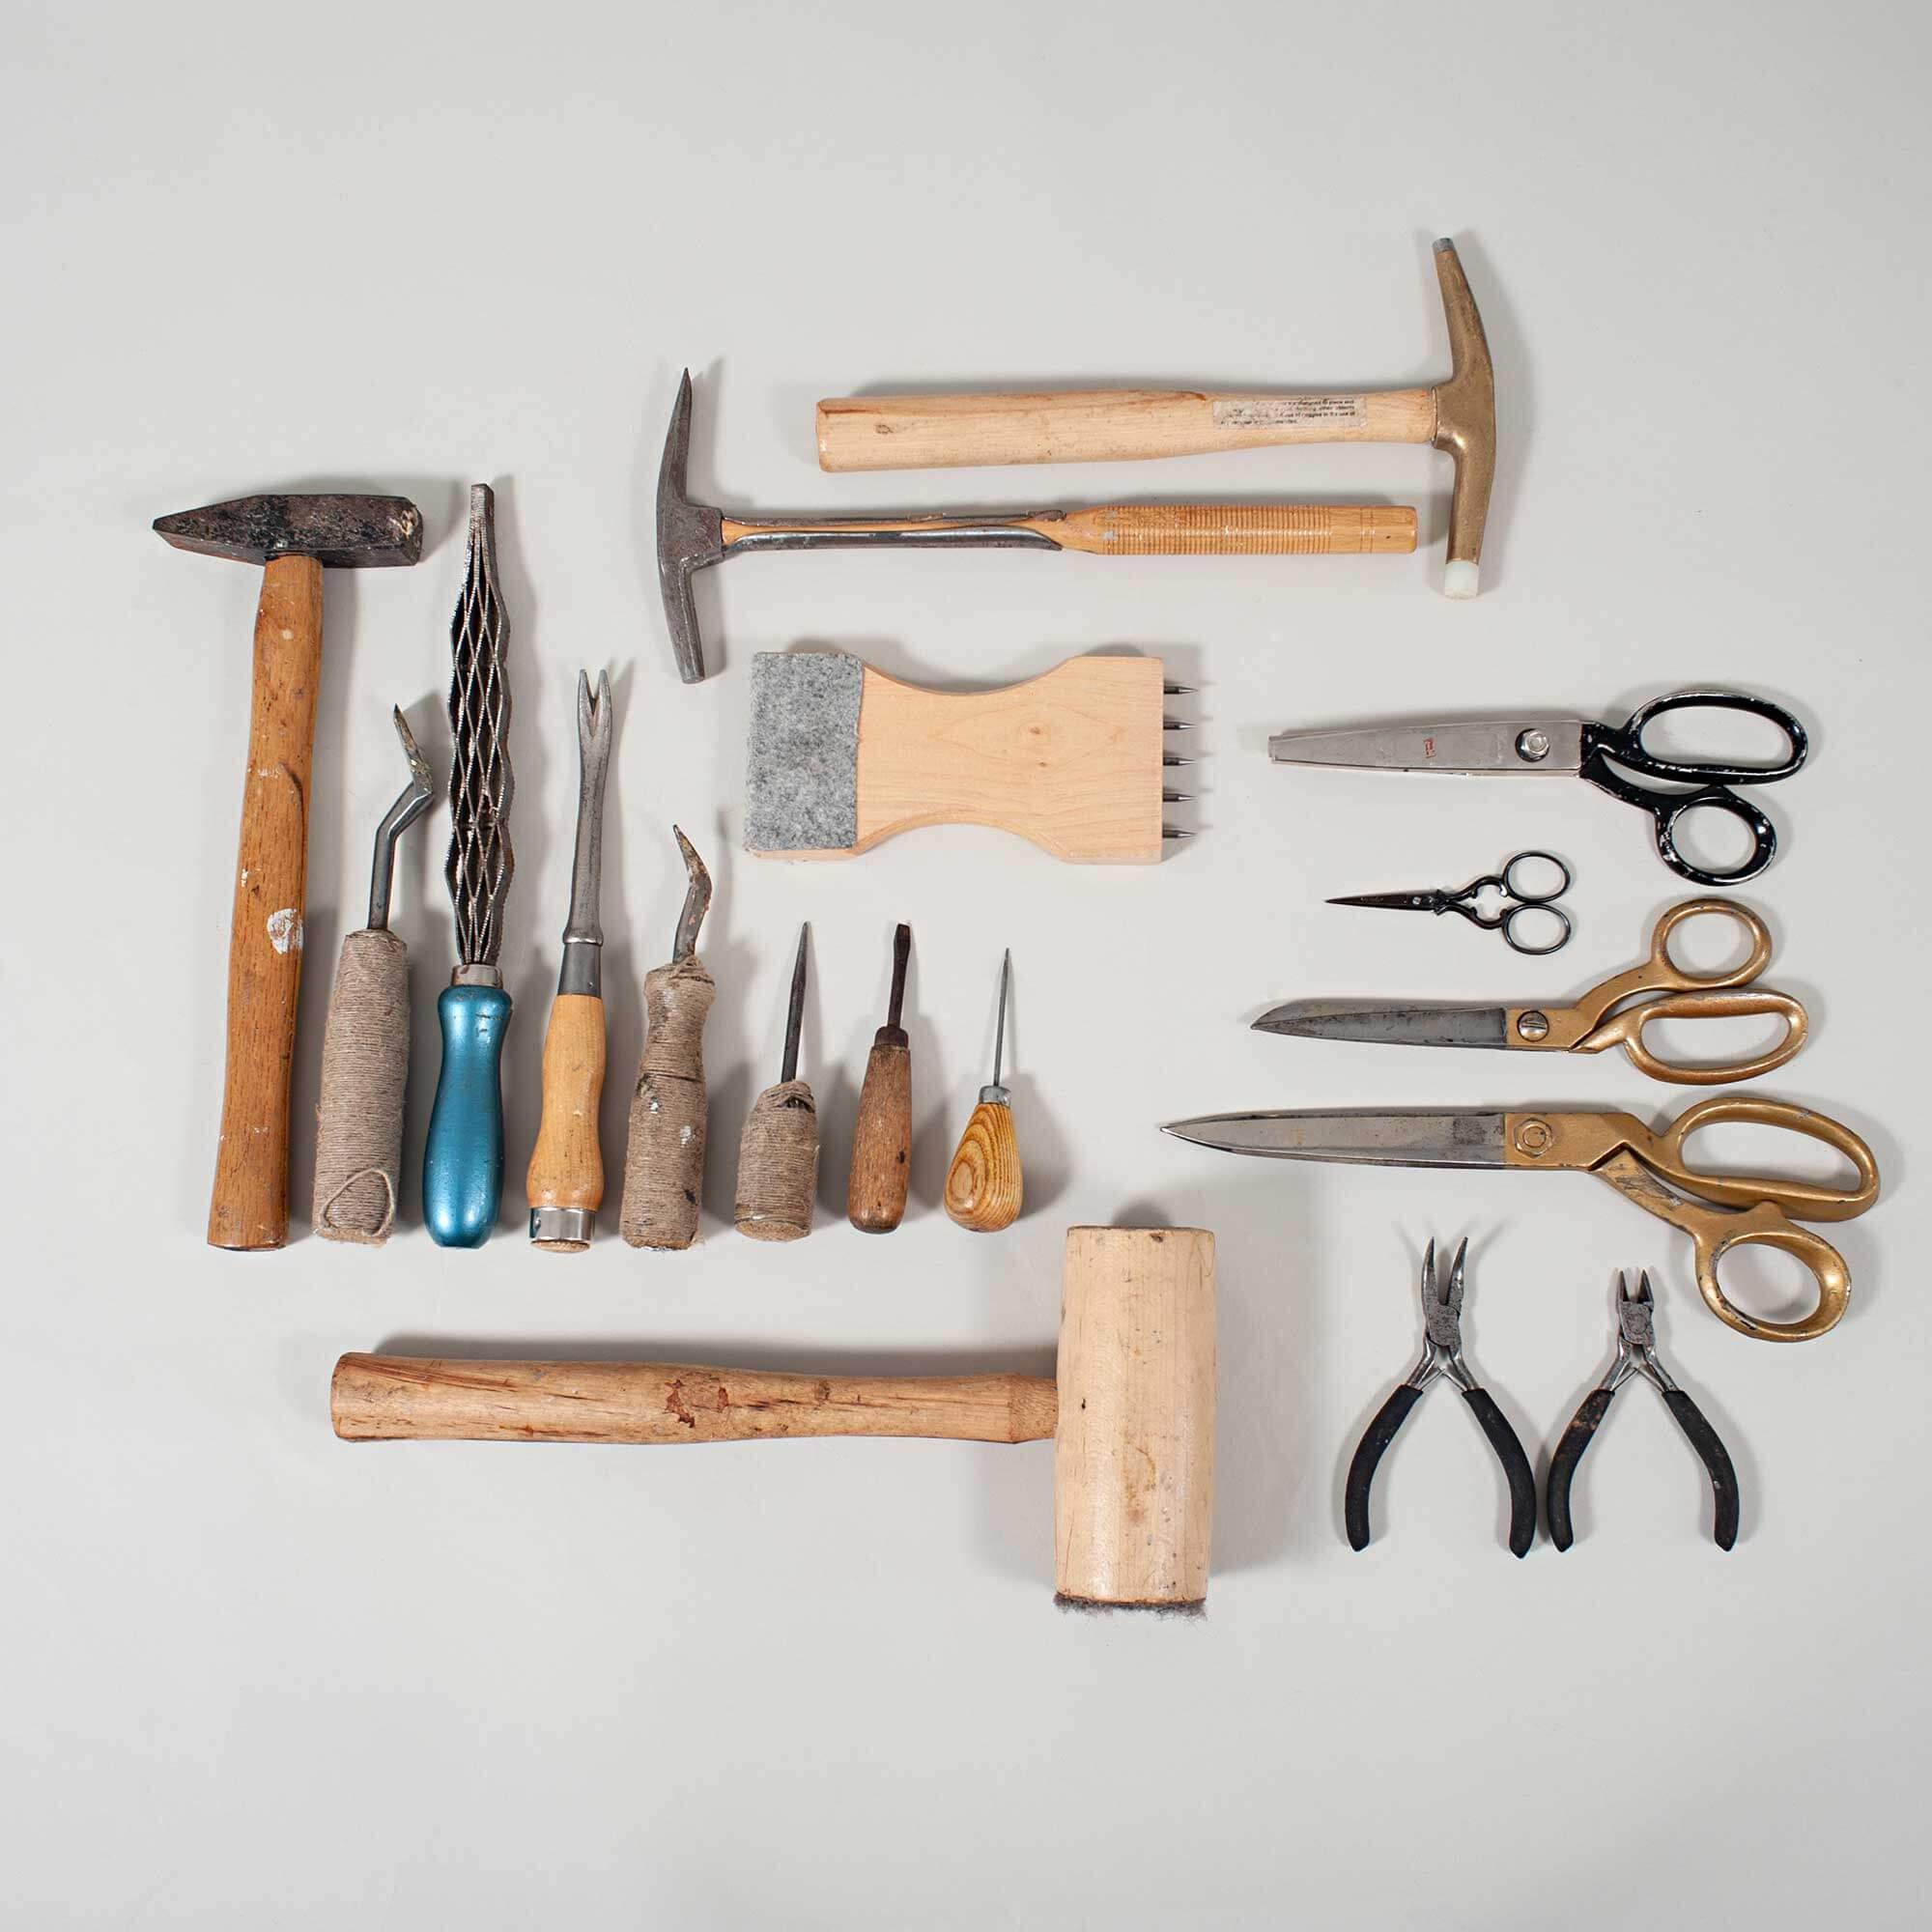 tools_web.jpg